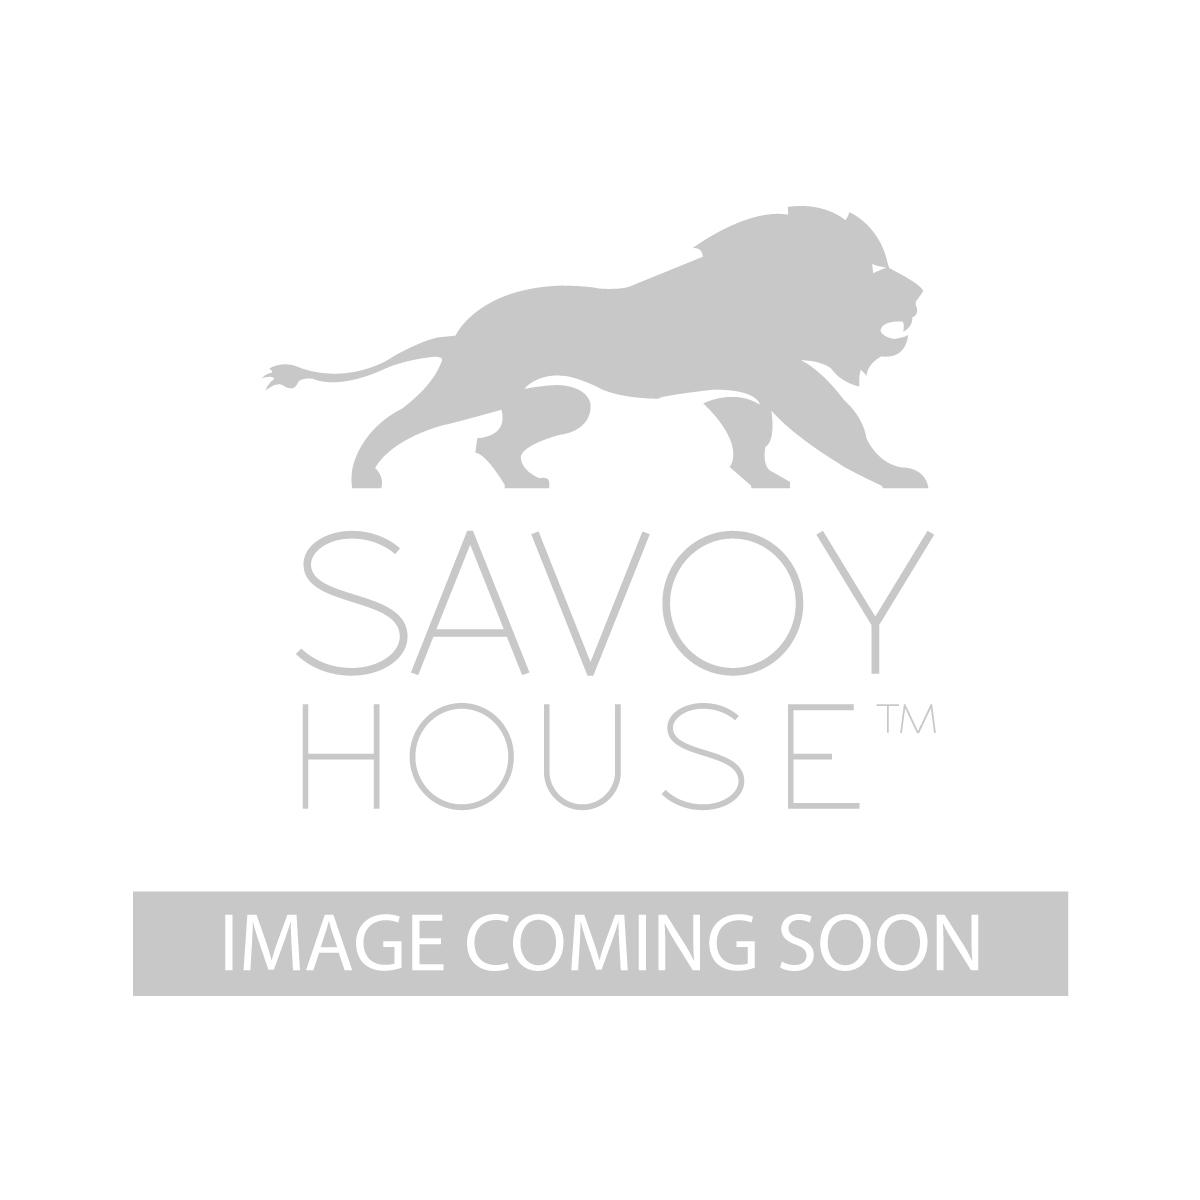 8 1075 2 11 salvador 2 light bath bar by savoy house for Www savoyhouse com